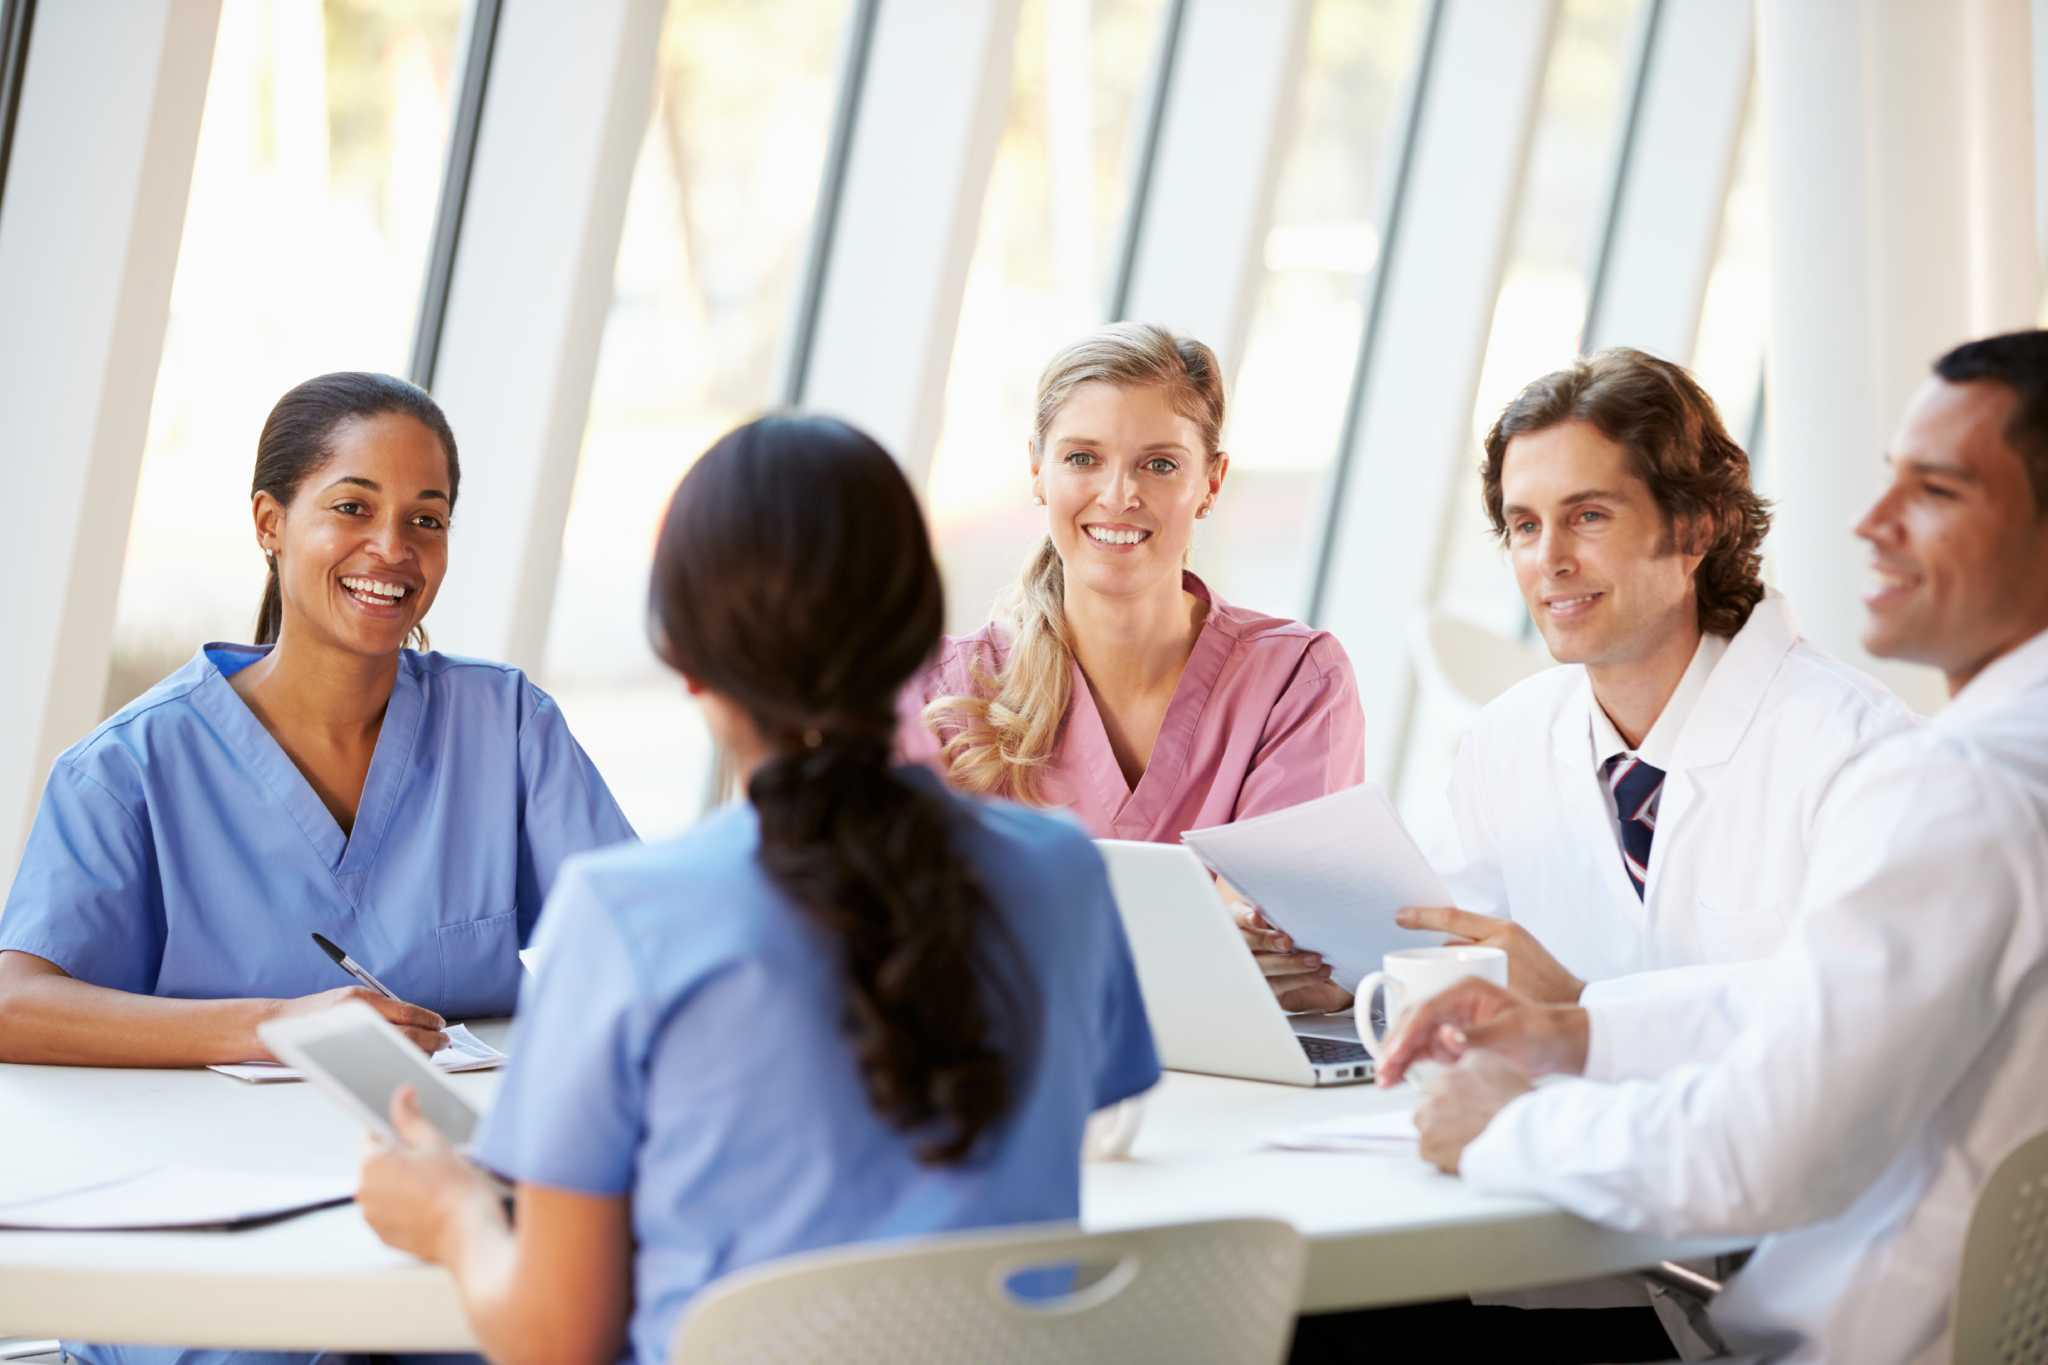 nursing leaders essential in providing quality health care nursing leaders essential in providing quality health care houston chronicle